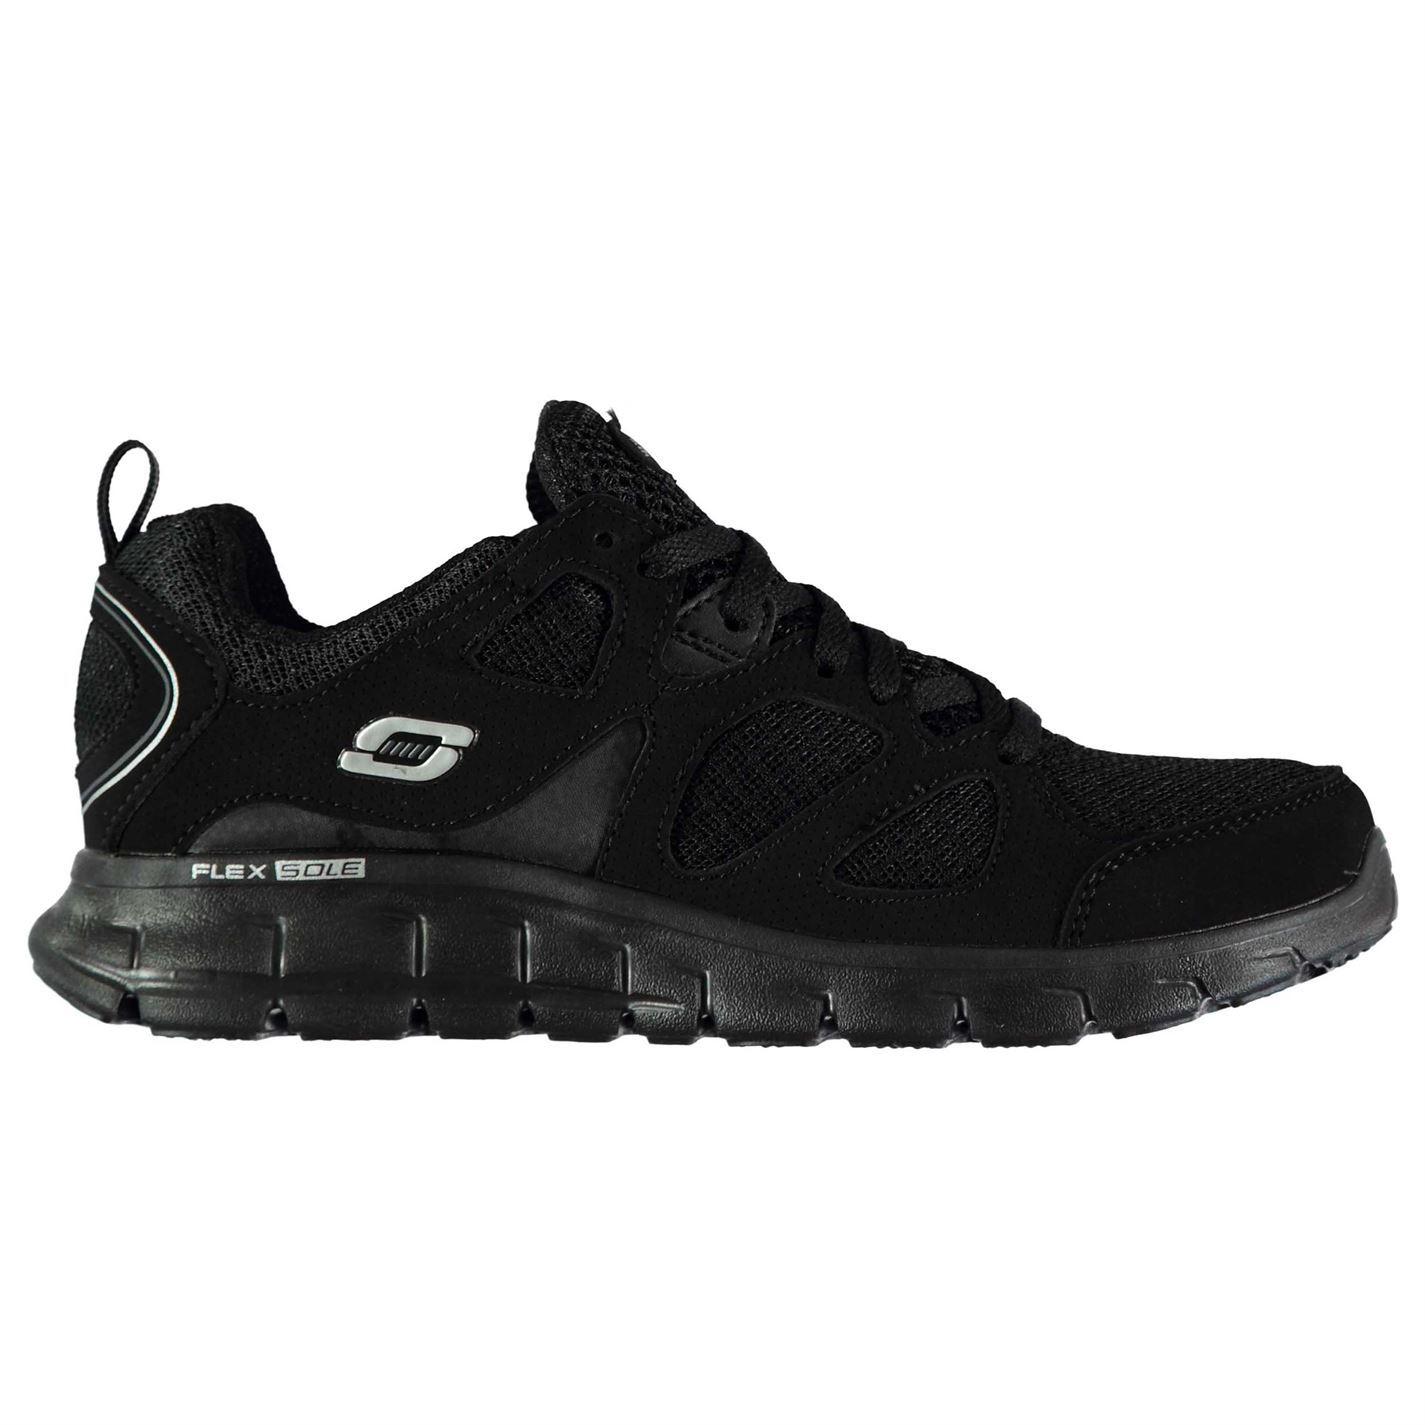 Skechers Vim Turbo Boys Trainers Shoes Footwear | eBay